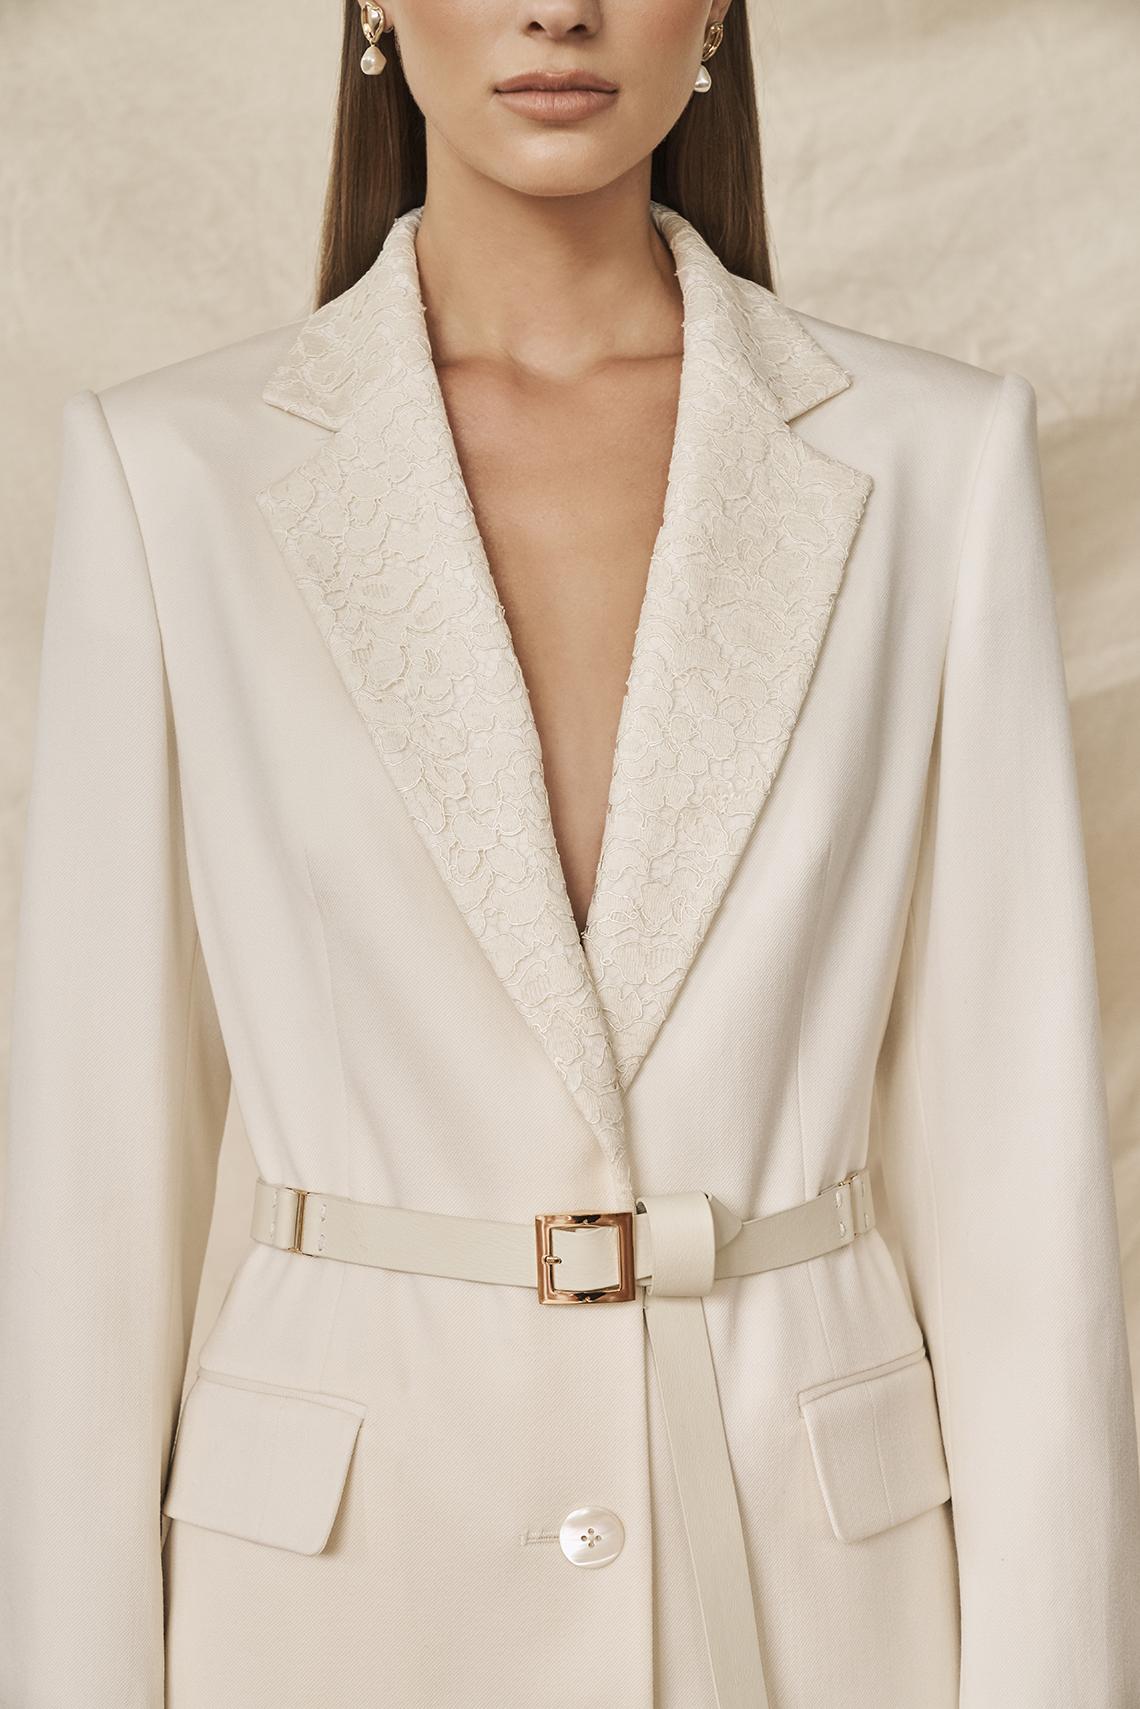 Martha Suarez 2022 Wedding Dress and Bridal Separates Collection – Bridal Musings 15